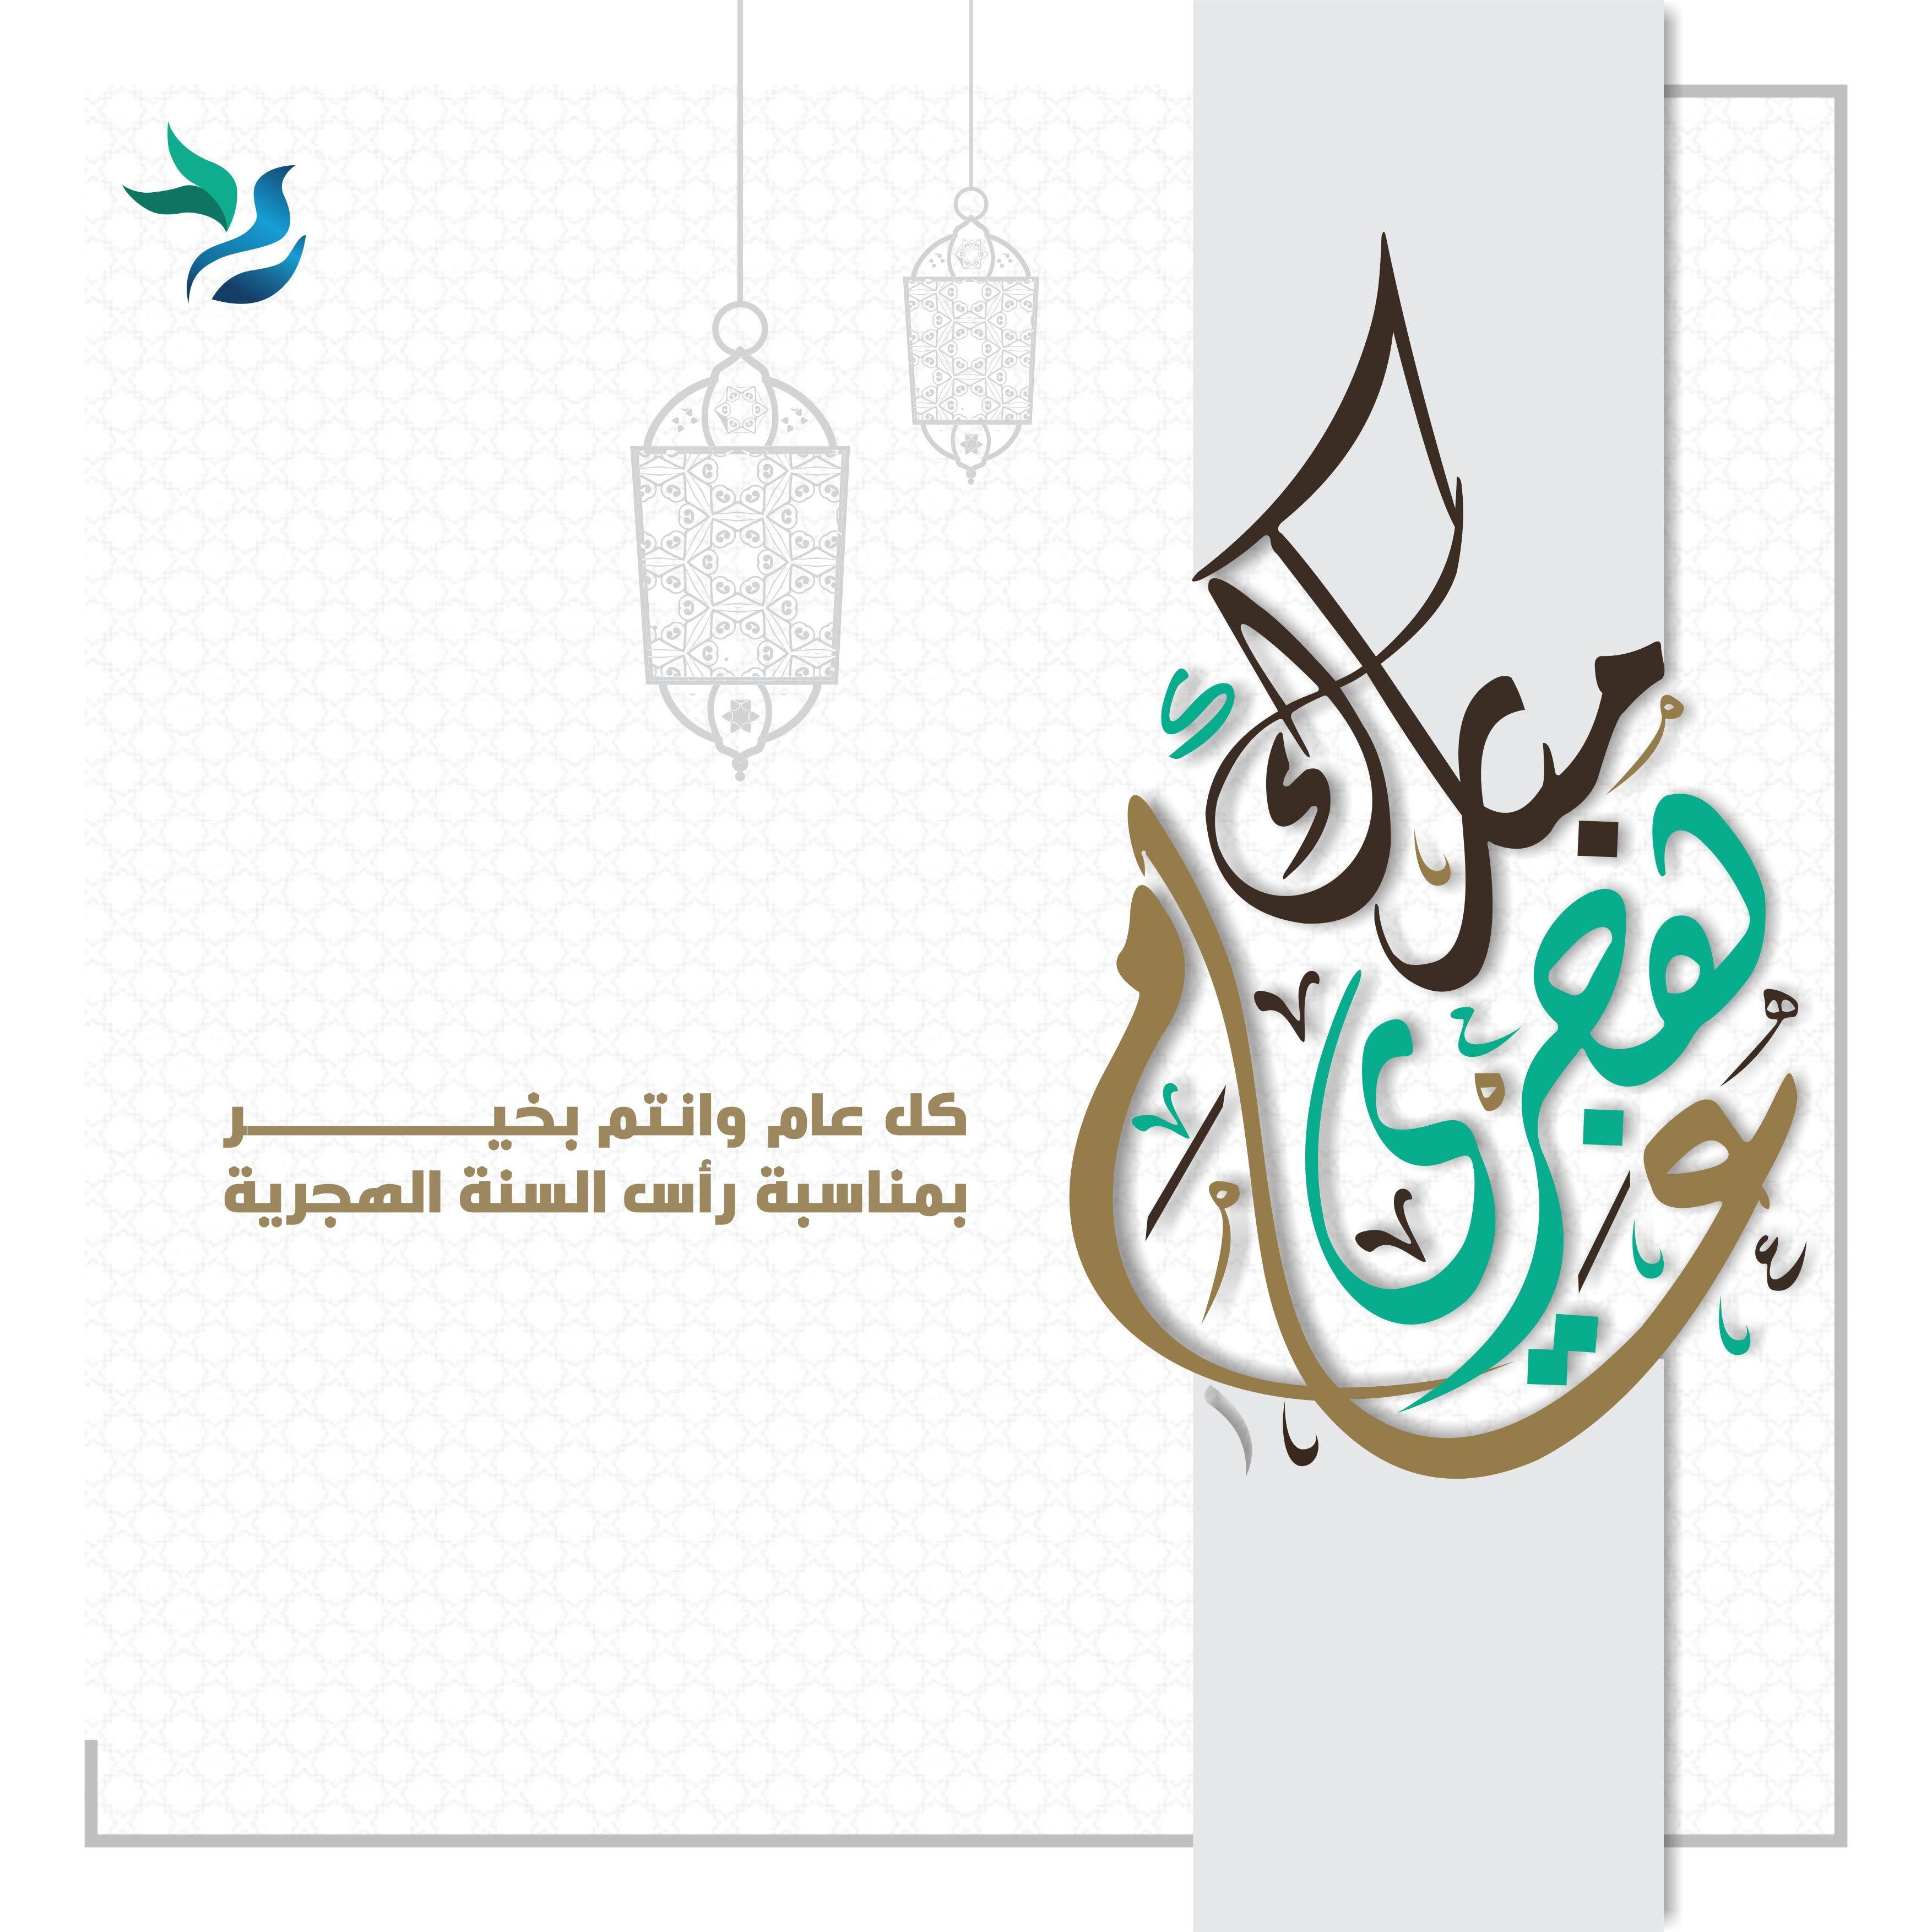 More تتقدم لكم مدينة الشارقة للواجهات المائية بأطيب التهاني بمناسبة السنة الهجرية الجديدة Sharjah Waterfront City Wishes You All A V Greetings Ramadan Arabic